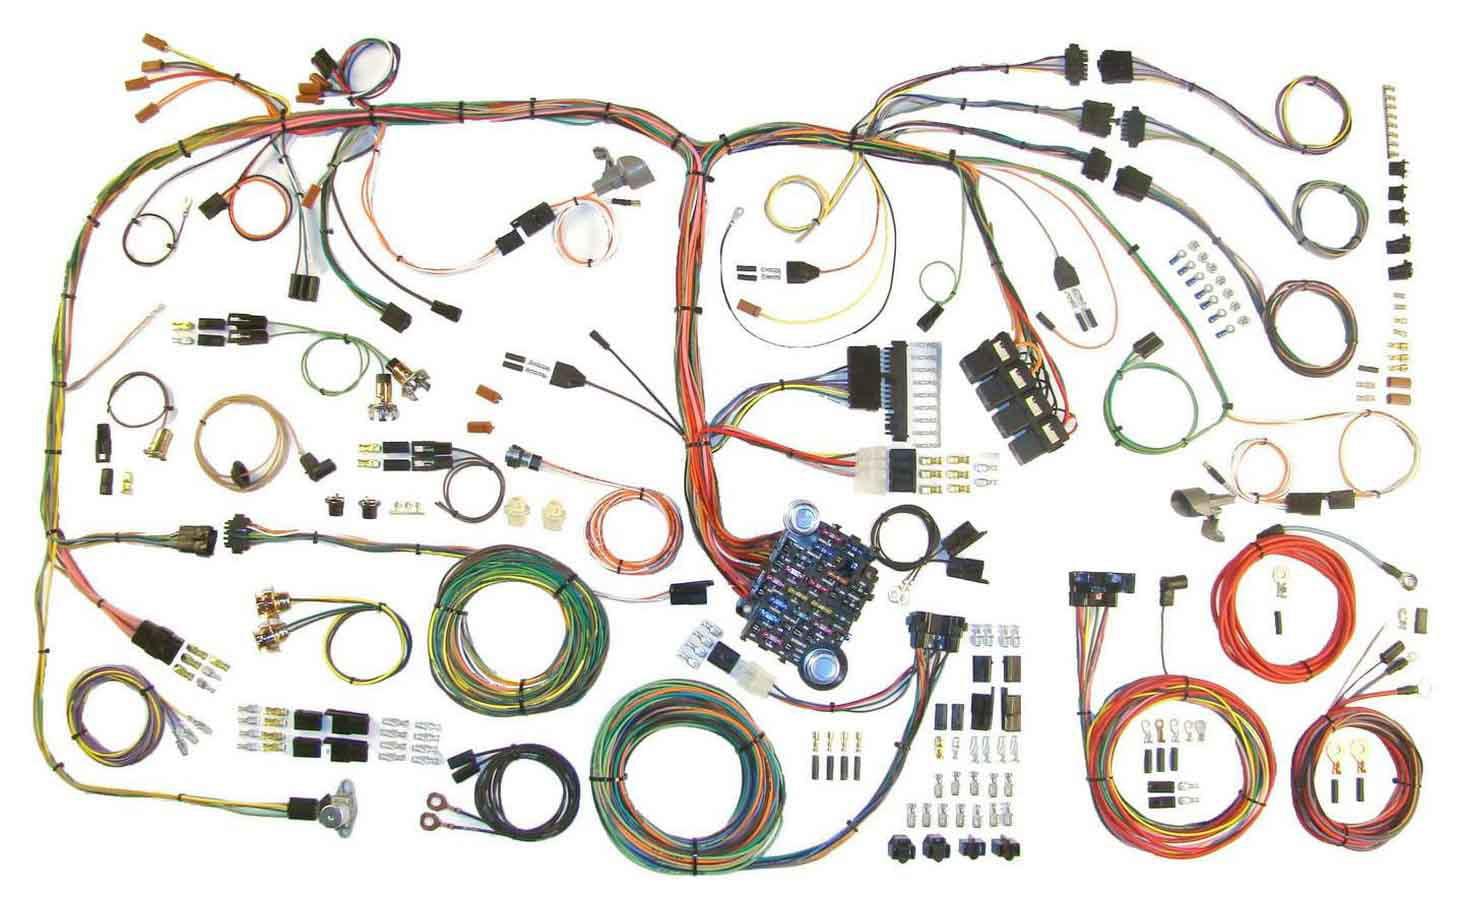 Stupendous American Autowire Wiring System Challenger 1970 74 Kit P N 510289 Wiring 101 Photwellnesstrialsorg